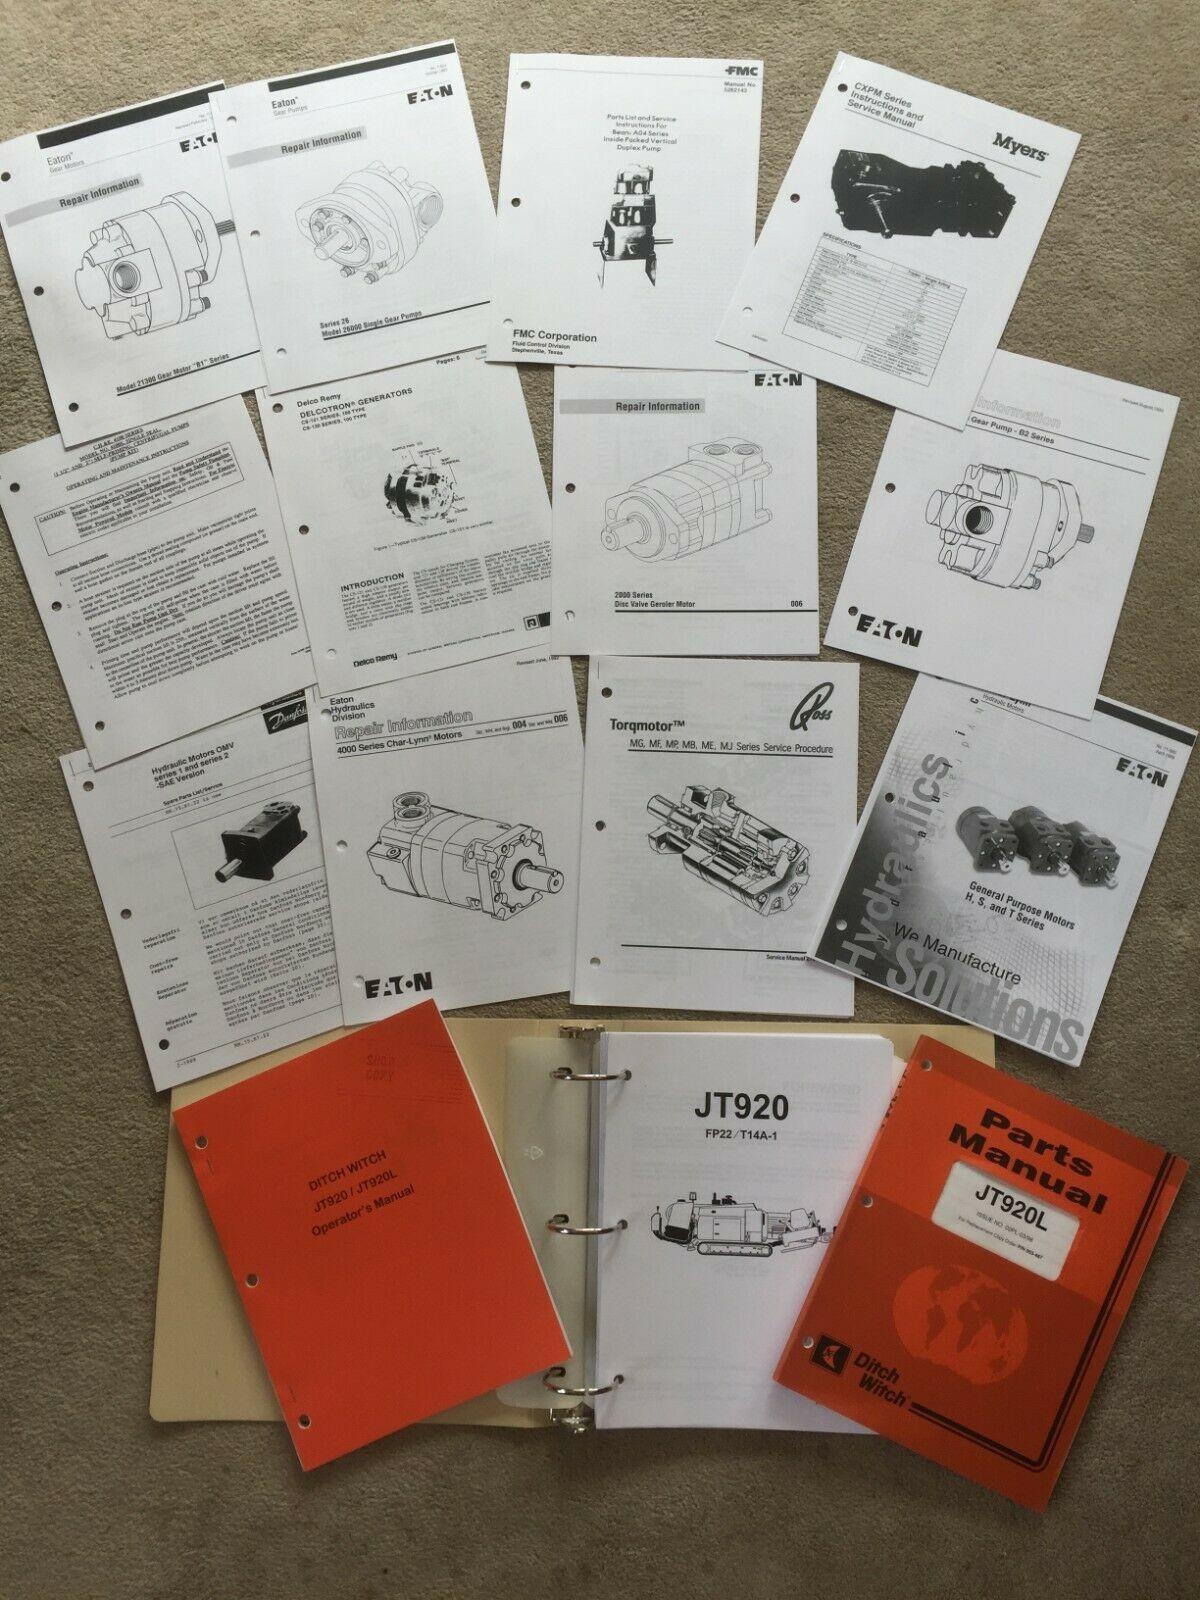 Ditch Witch 1030 Parts Breakdown Ditch Witch Jt920l Repair Service Parts Manuals Literature Of Ditch Witch 1030 Parts Breakdown